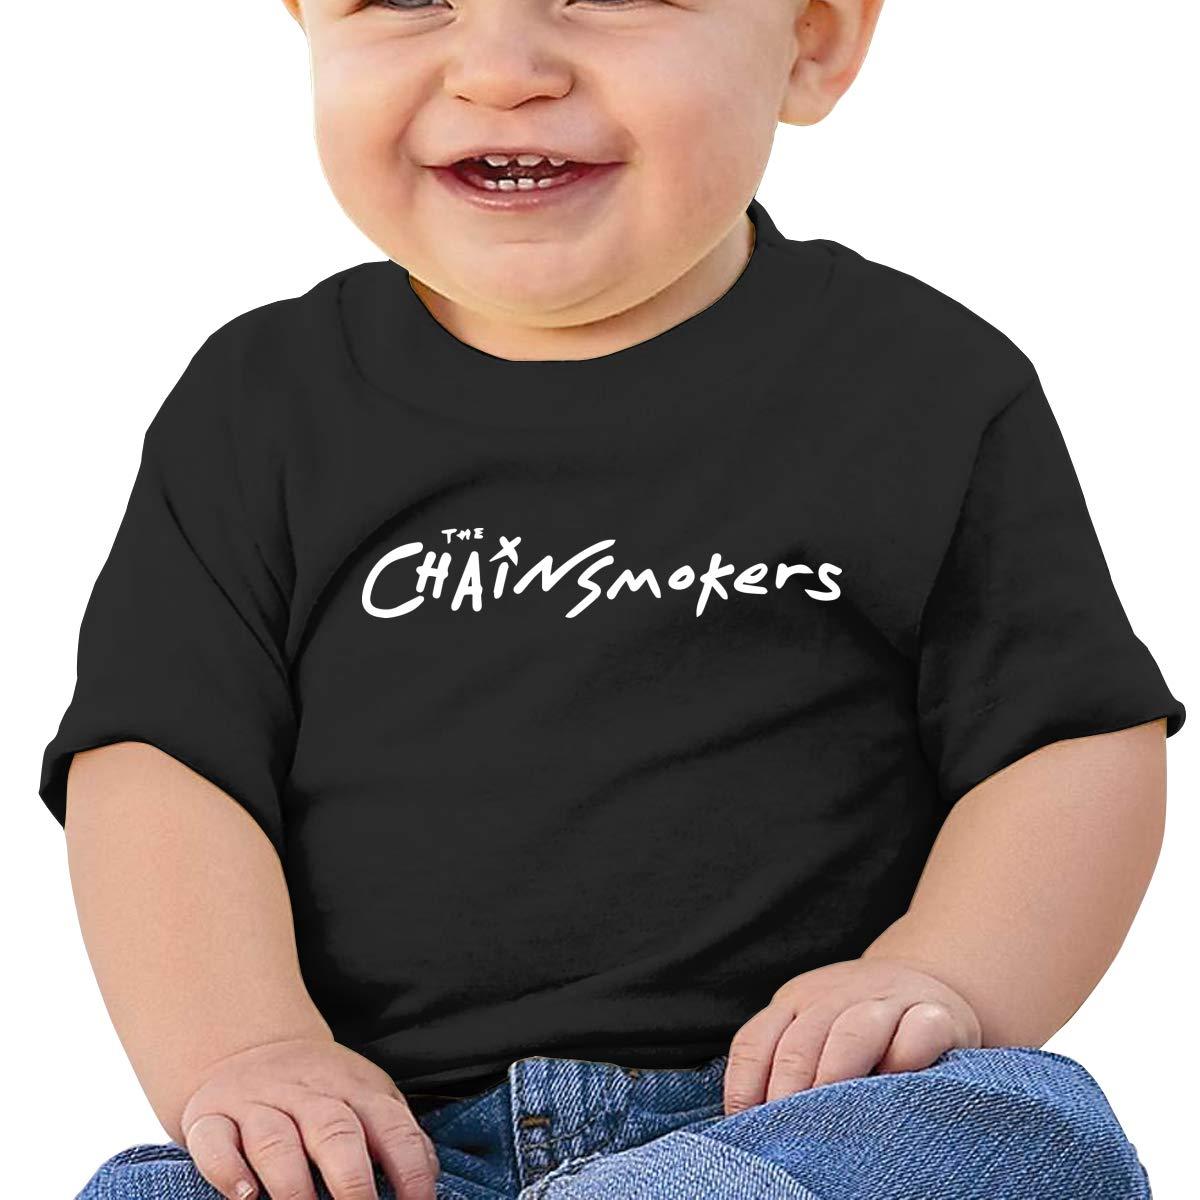 Kangtians Baby Chainsmokers Shirts Tee Toddler Shirt